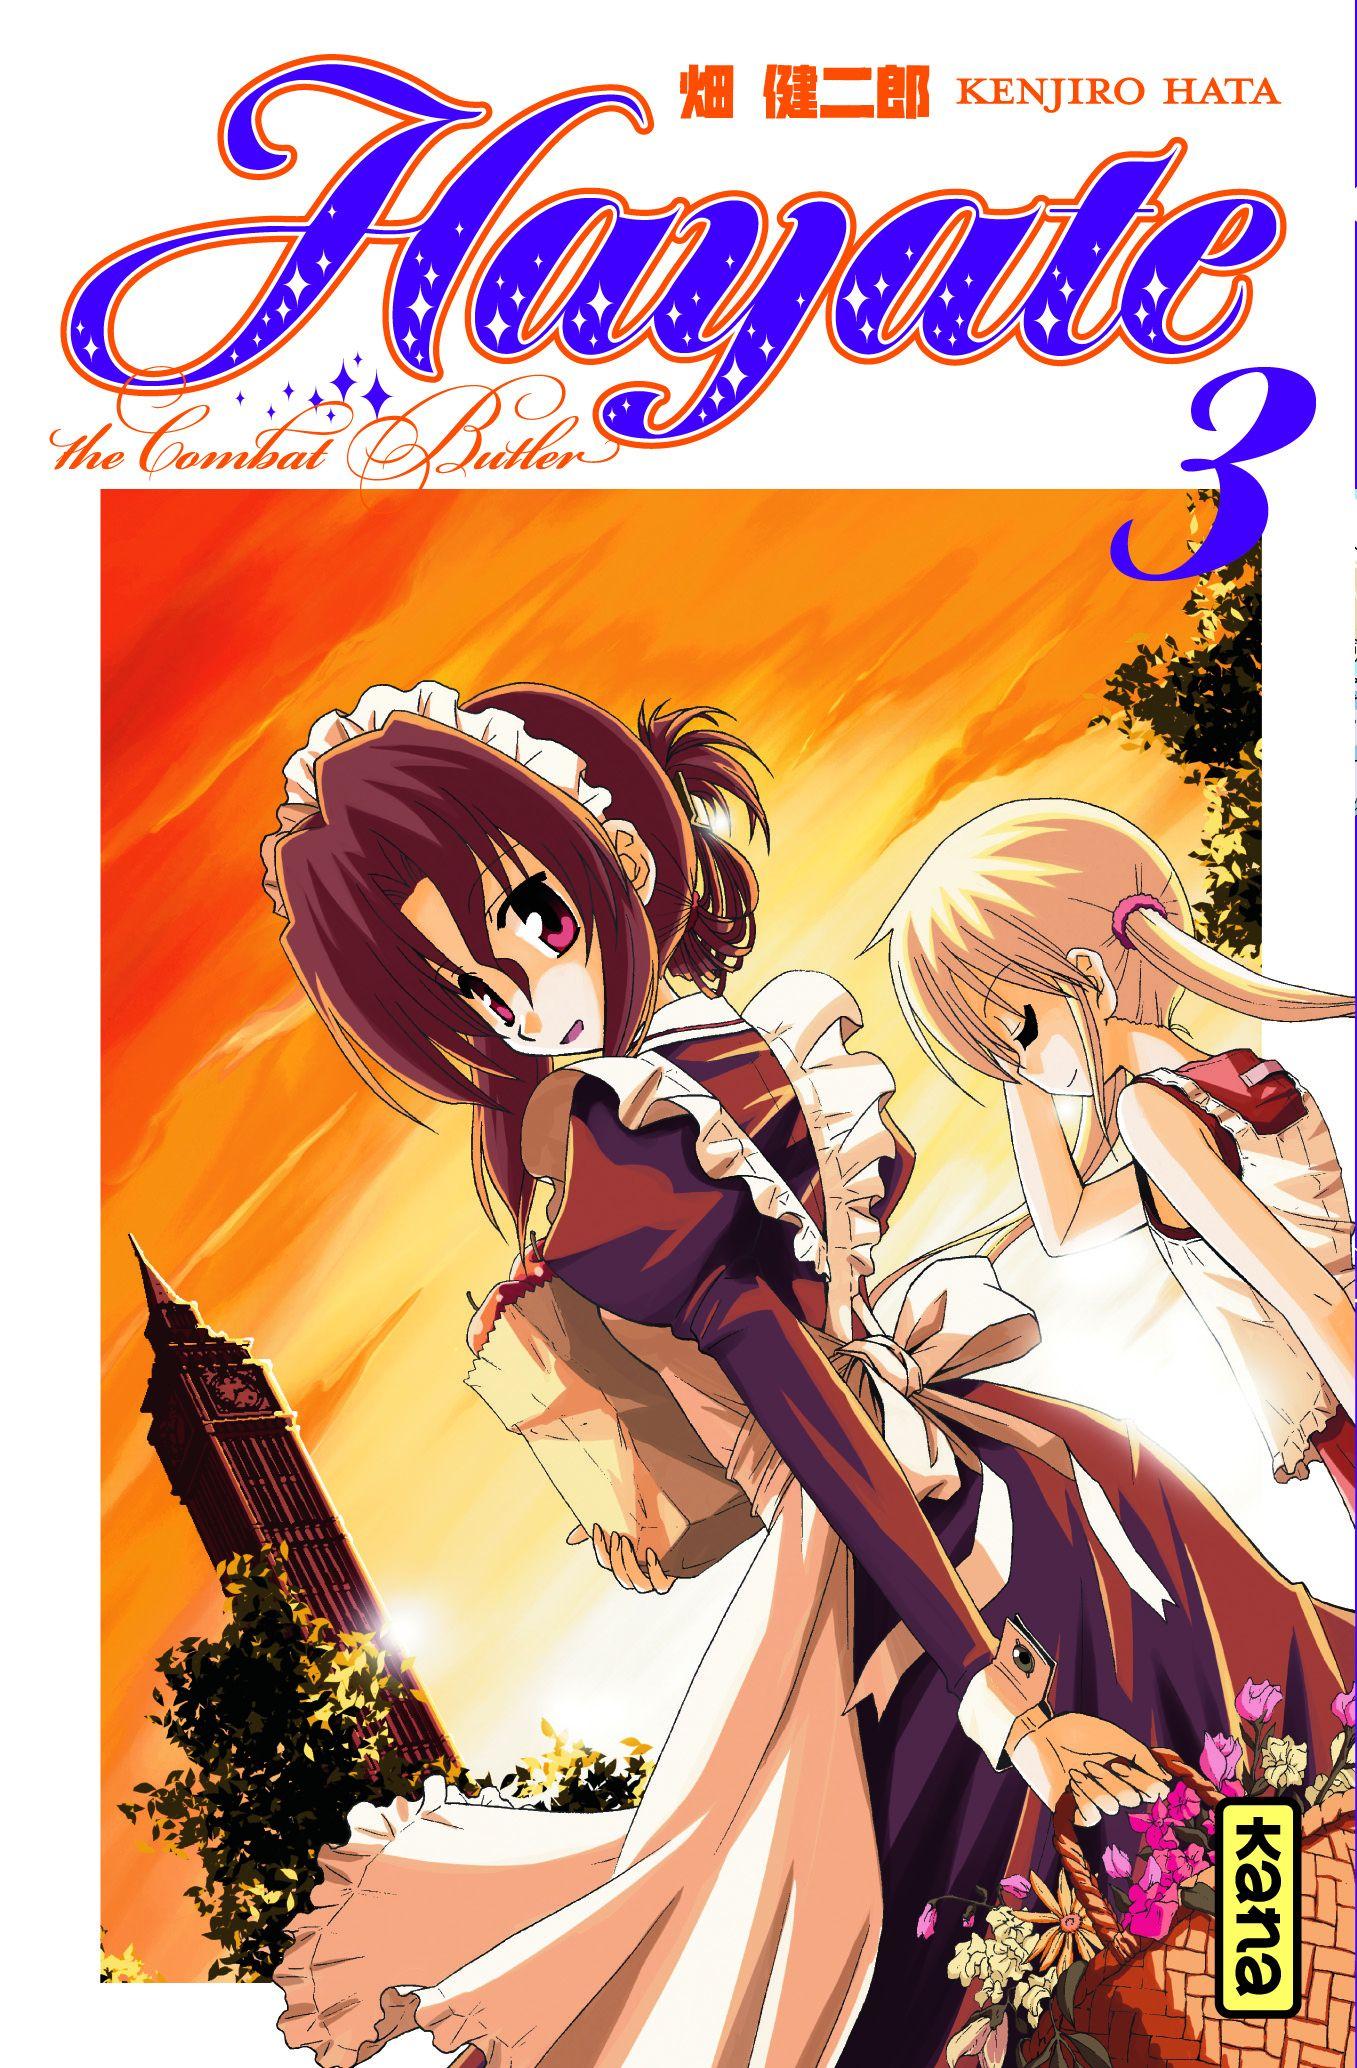 http://www.manga-news.com/public/images/vols/hayate-combat-buttler-3-kana.jpg